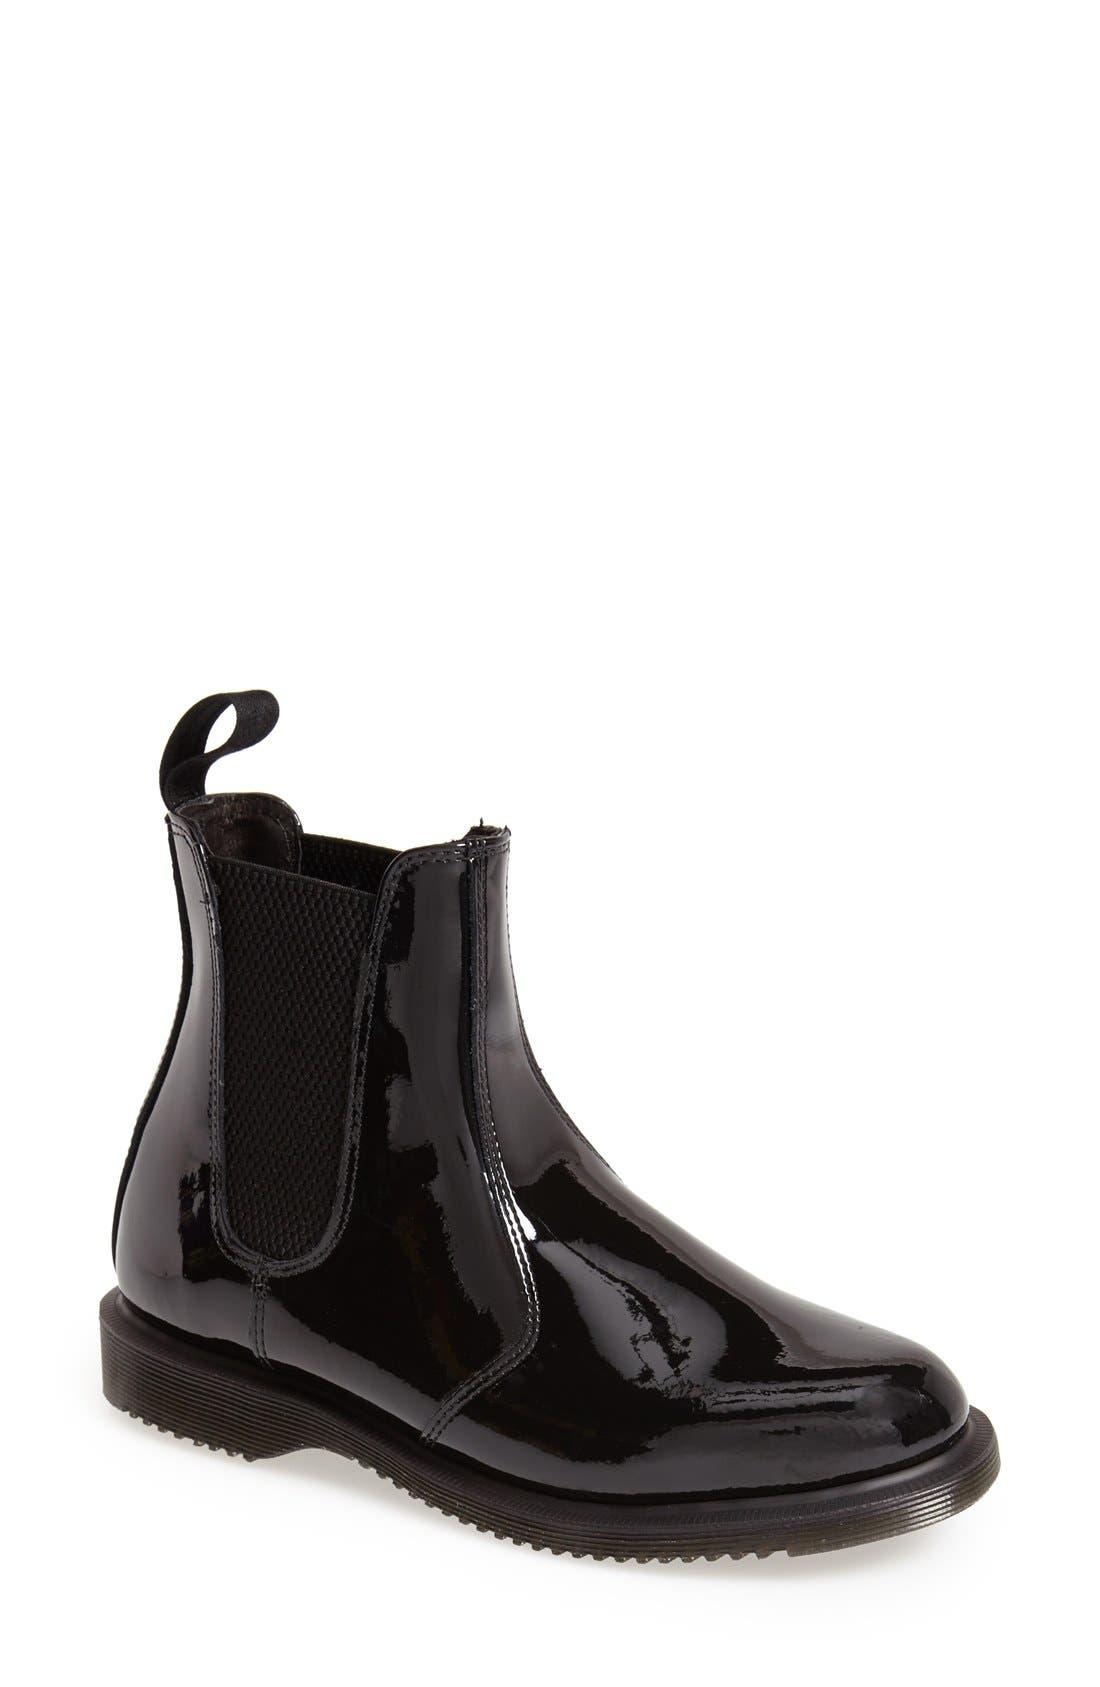 Alternate Image 1 Selected - Dr. Martens 'Faun' Patent Chelsea Boot (Women)